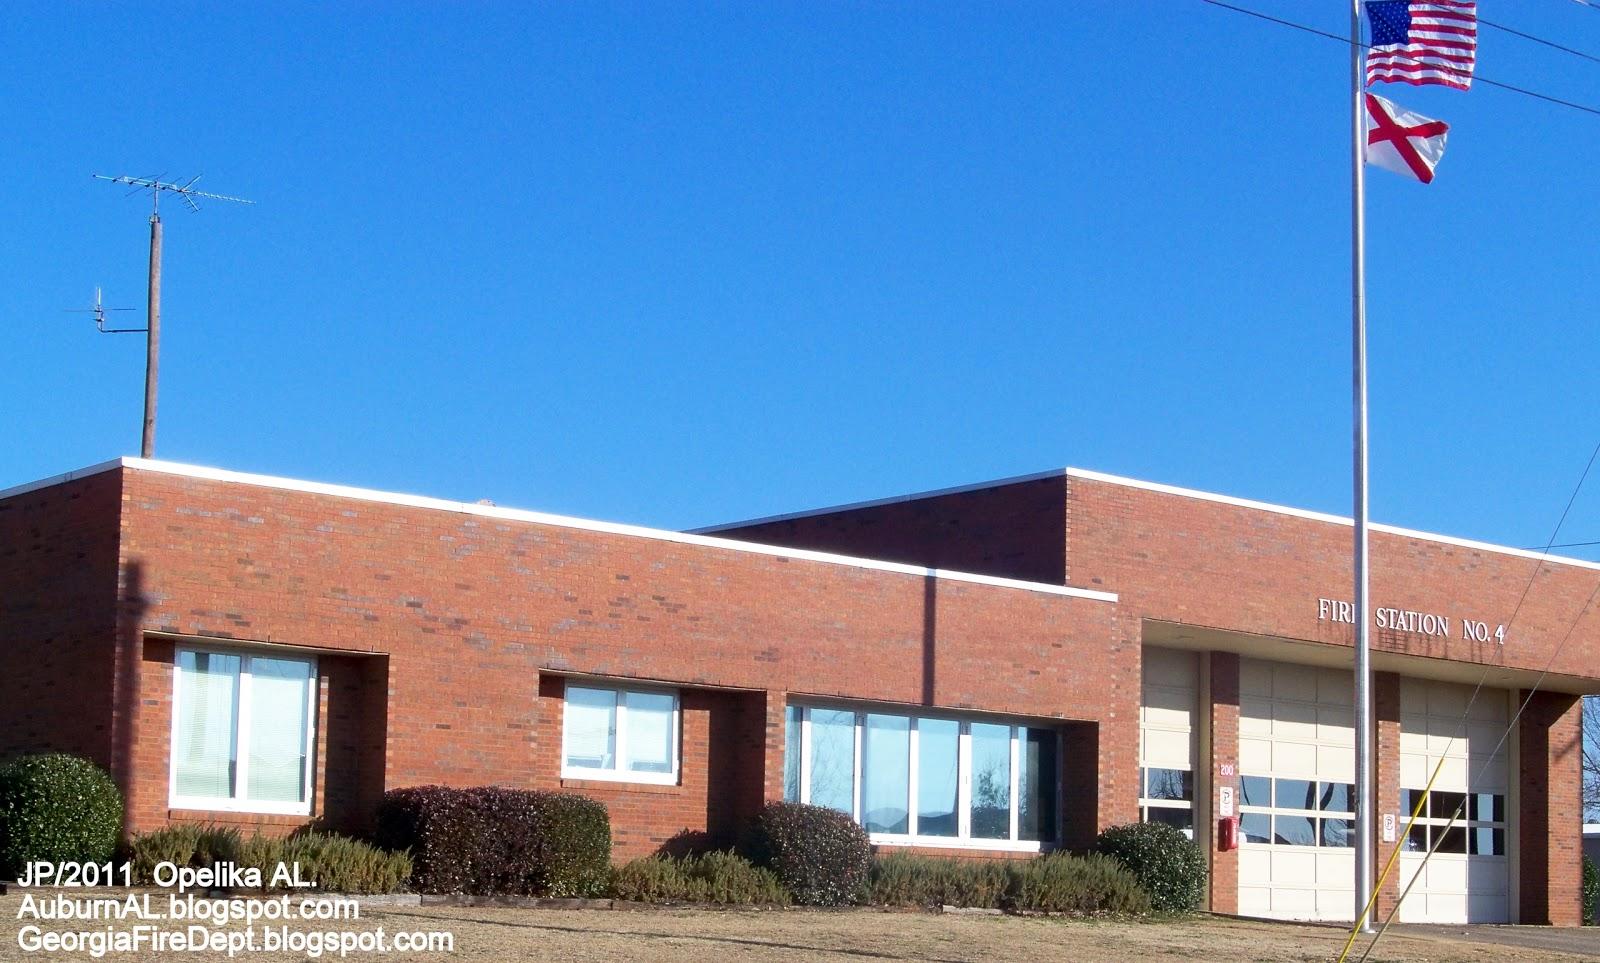 Alabama lee county salem - Station 4 Opelika Alabama Fire Department Lee County Al 200 Lake Condy Rd Opelika Al 36801